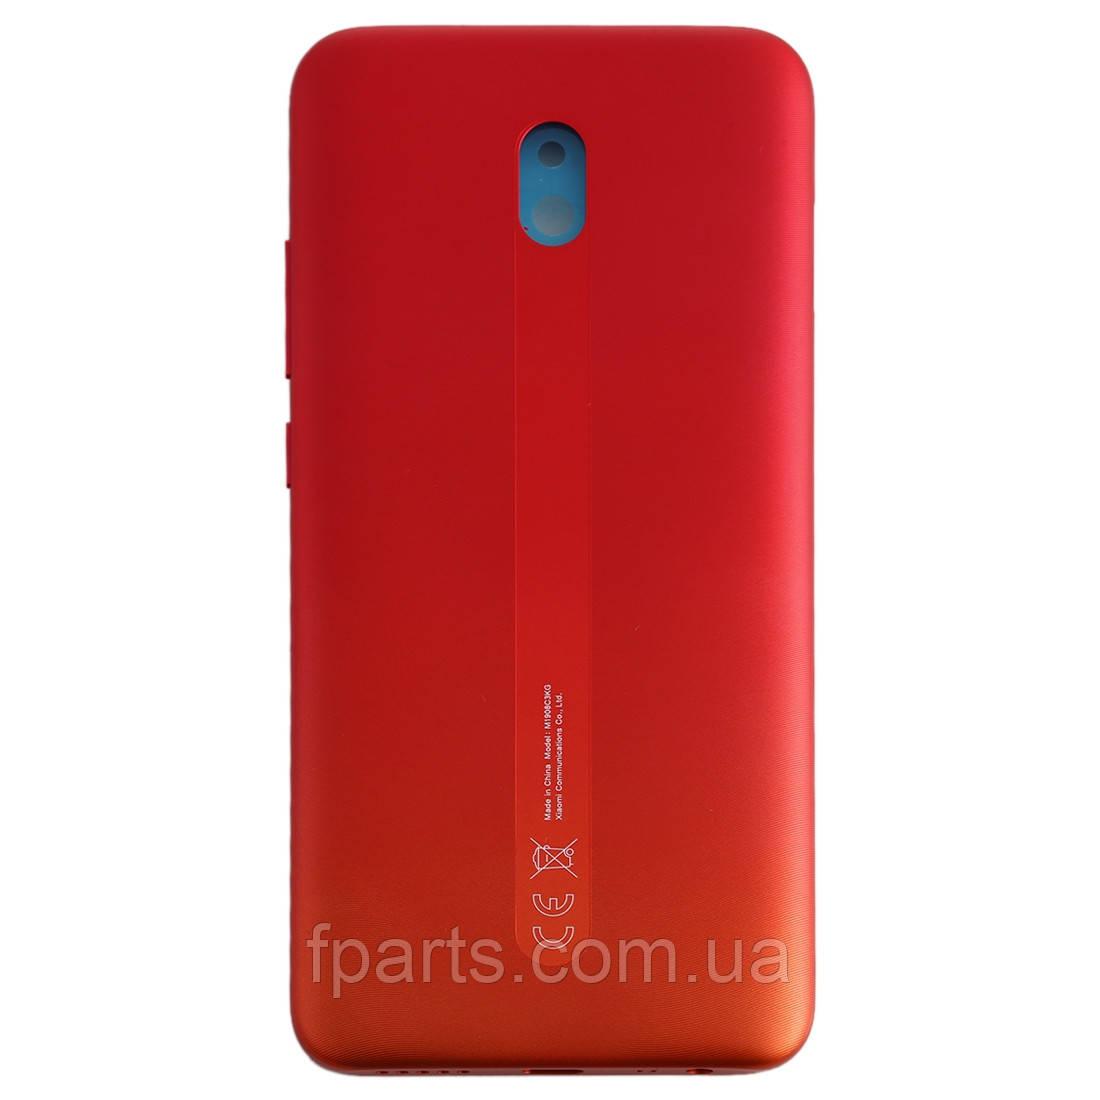 Задняя крышка Xiaomi Redmi 8A, Red (AAA)